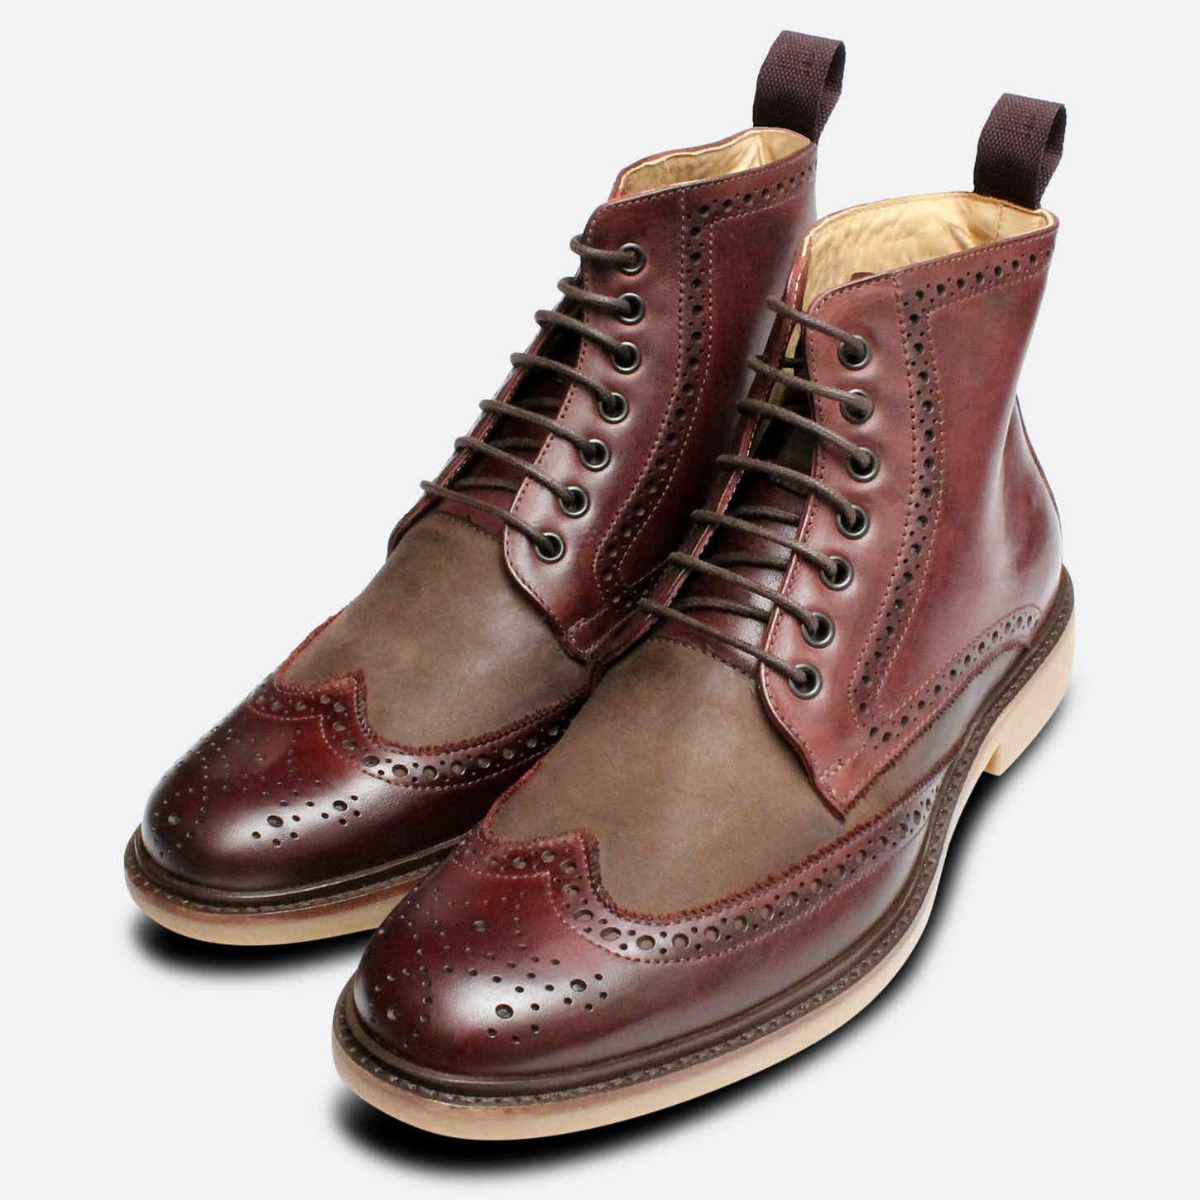 Tone Brogue By Burgundy New Boots Shoes Anatomic Two zw6U5U